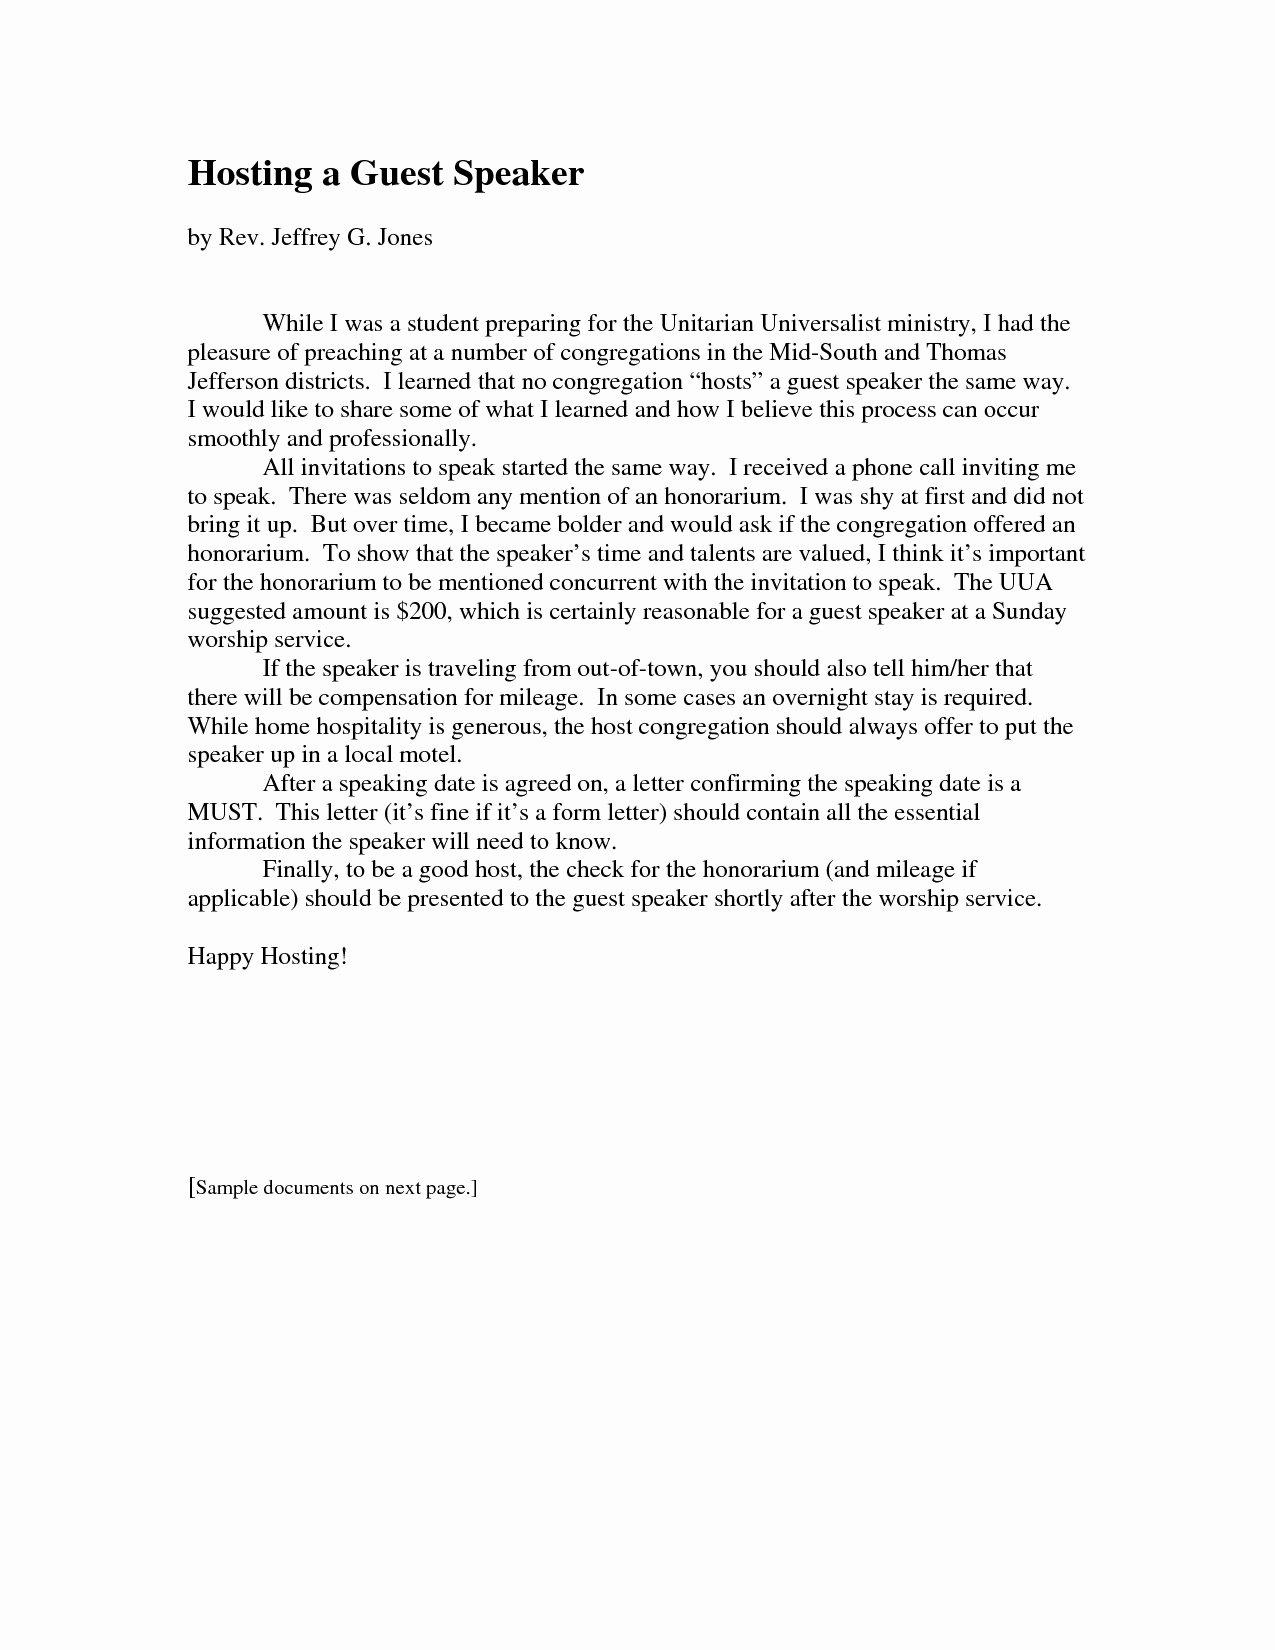 Letter Of Graduation Inspirational Invitation Letter Guest Speaker Graduation Ceremony